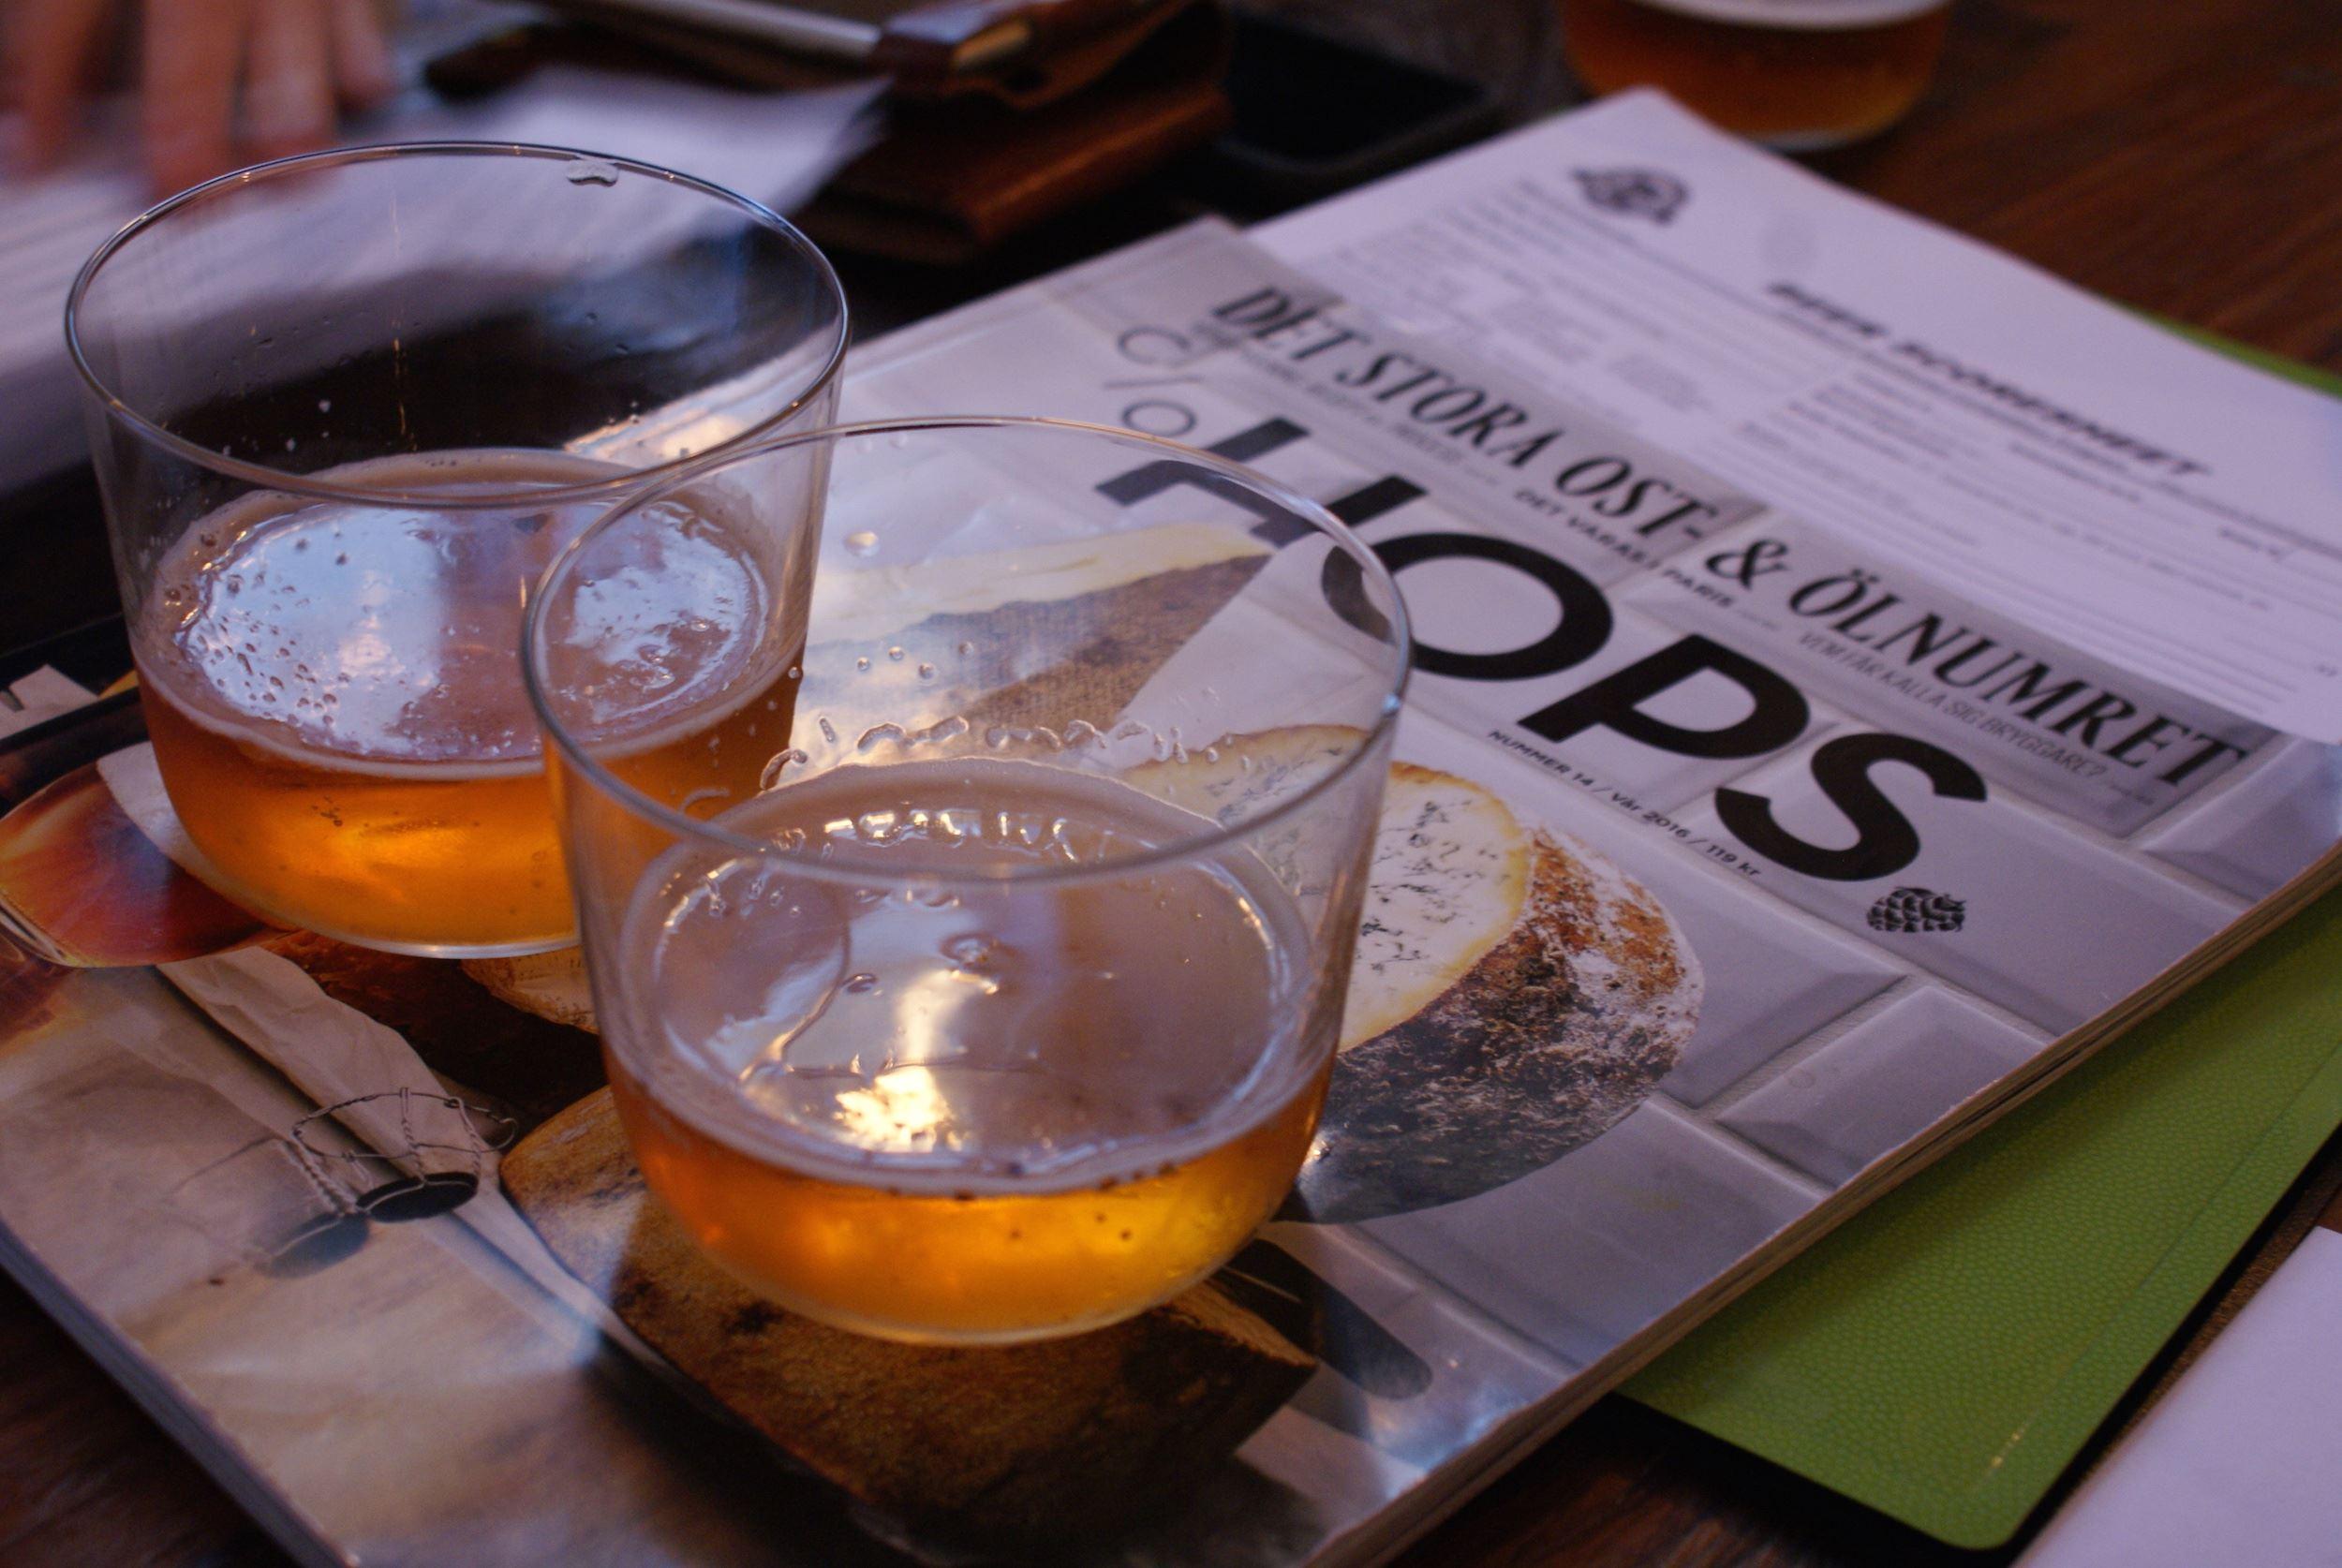 Stockholm Craft Beer tour in English